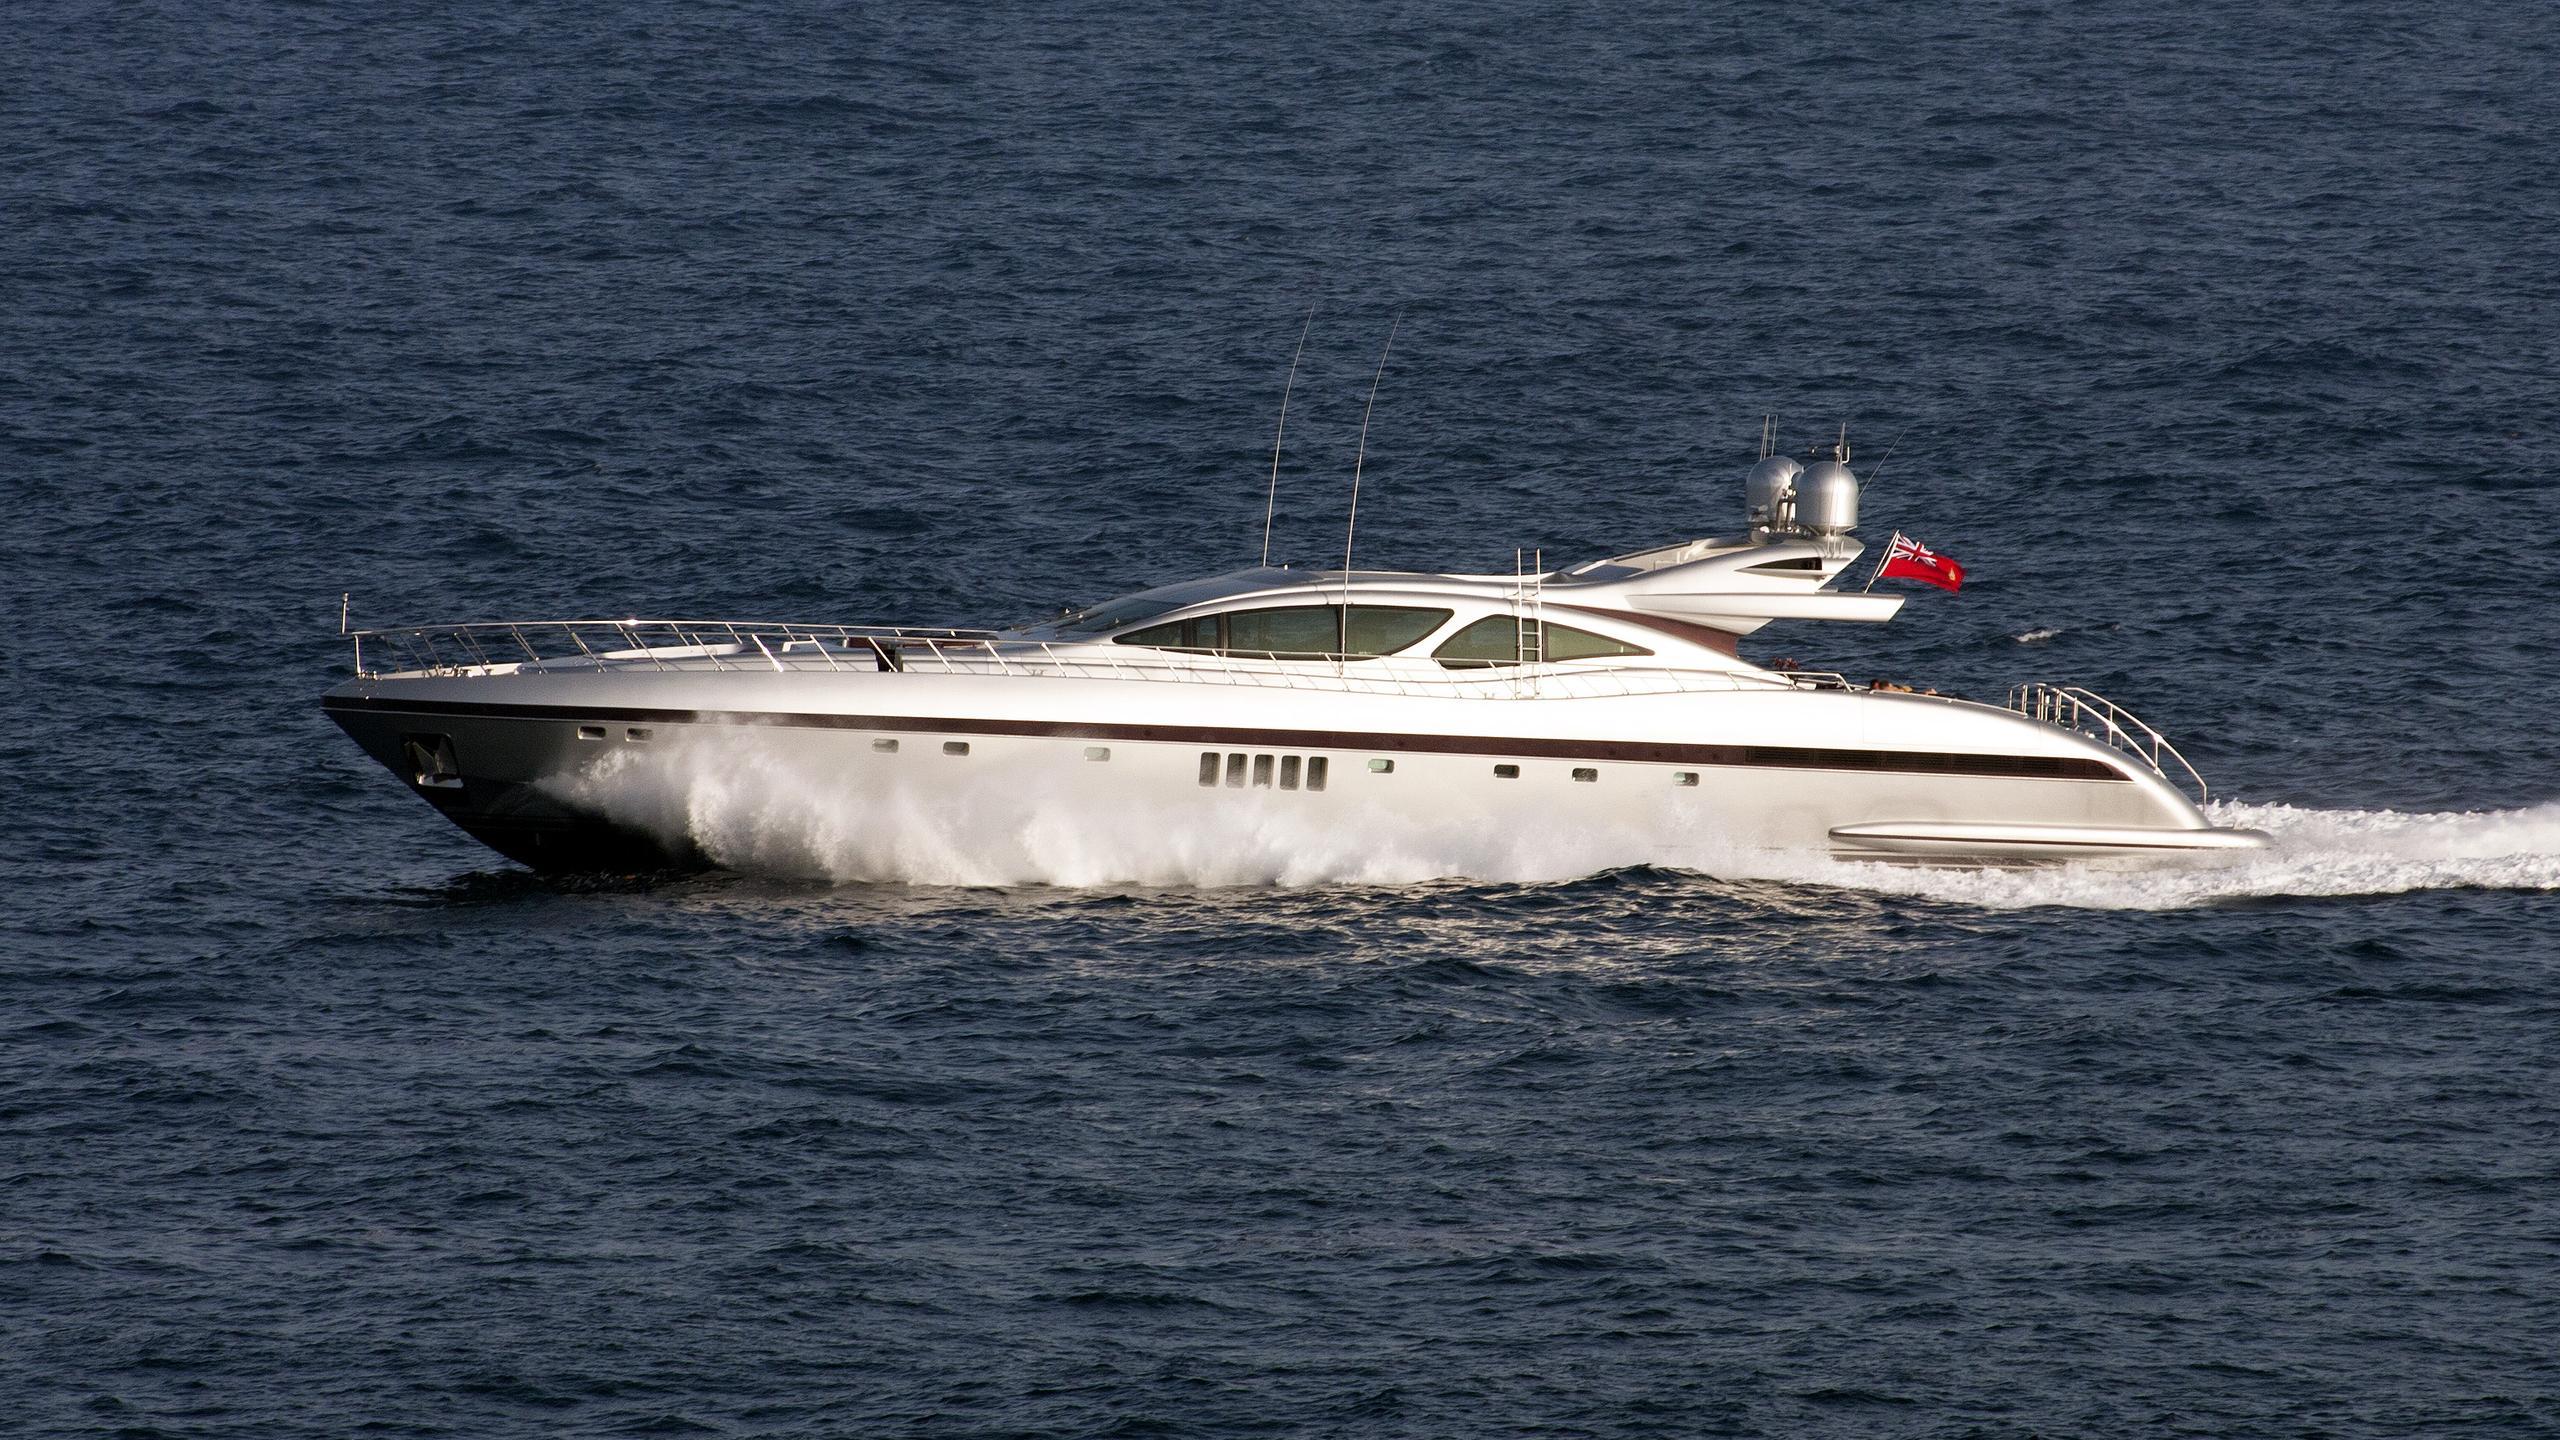 awesome-motoryacht-overmarine-mangusta-130-2005-39m-profile-running